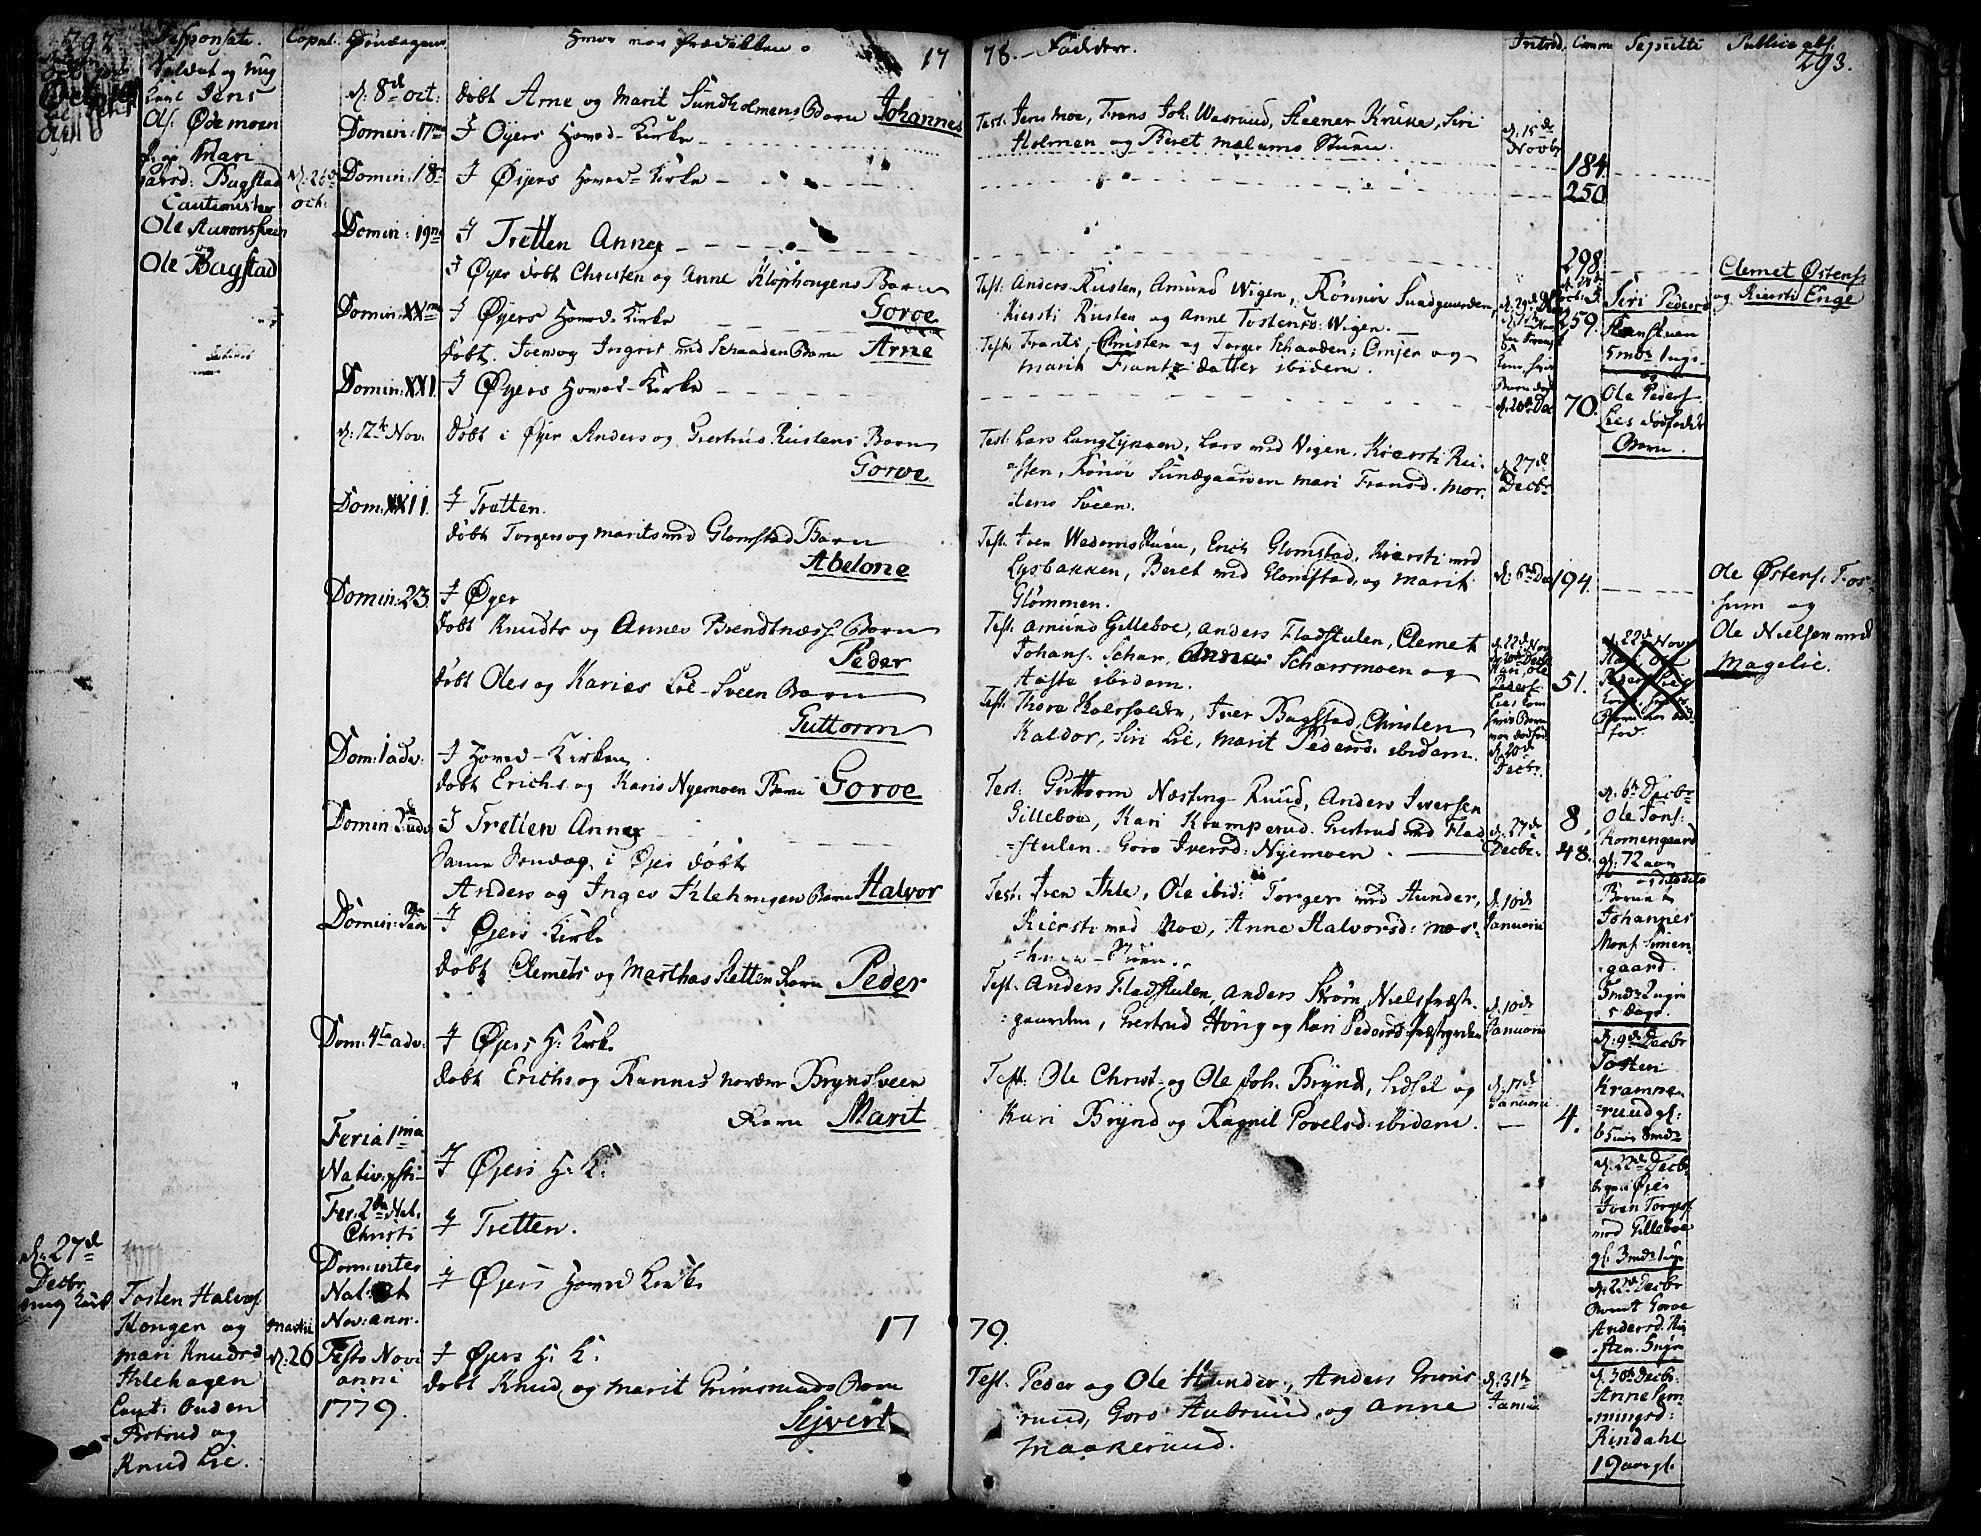 SAH, Øyer prestekontor, Ministerialbok nr. 2, 1733-1784, s. 292-293